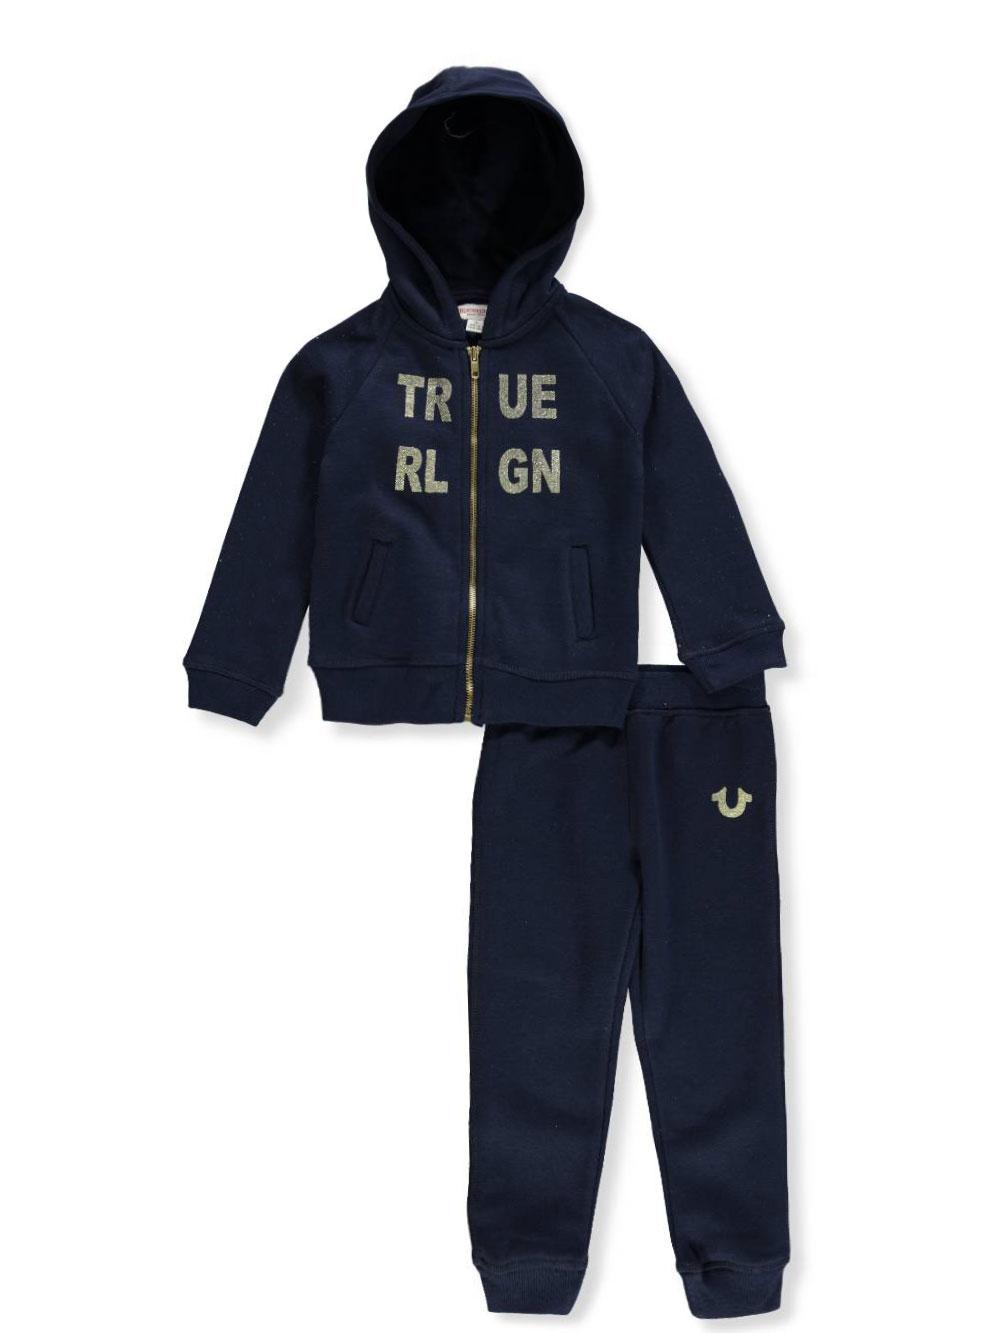 47b45dfaf True Religion Girls' 2-Piece Sweatsuit Pants Set